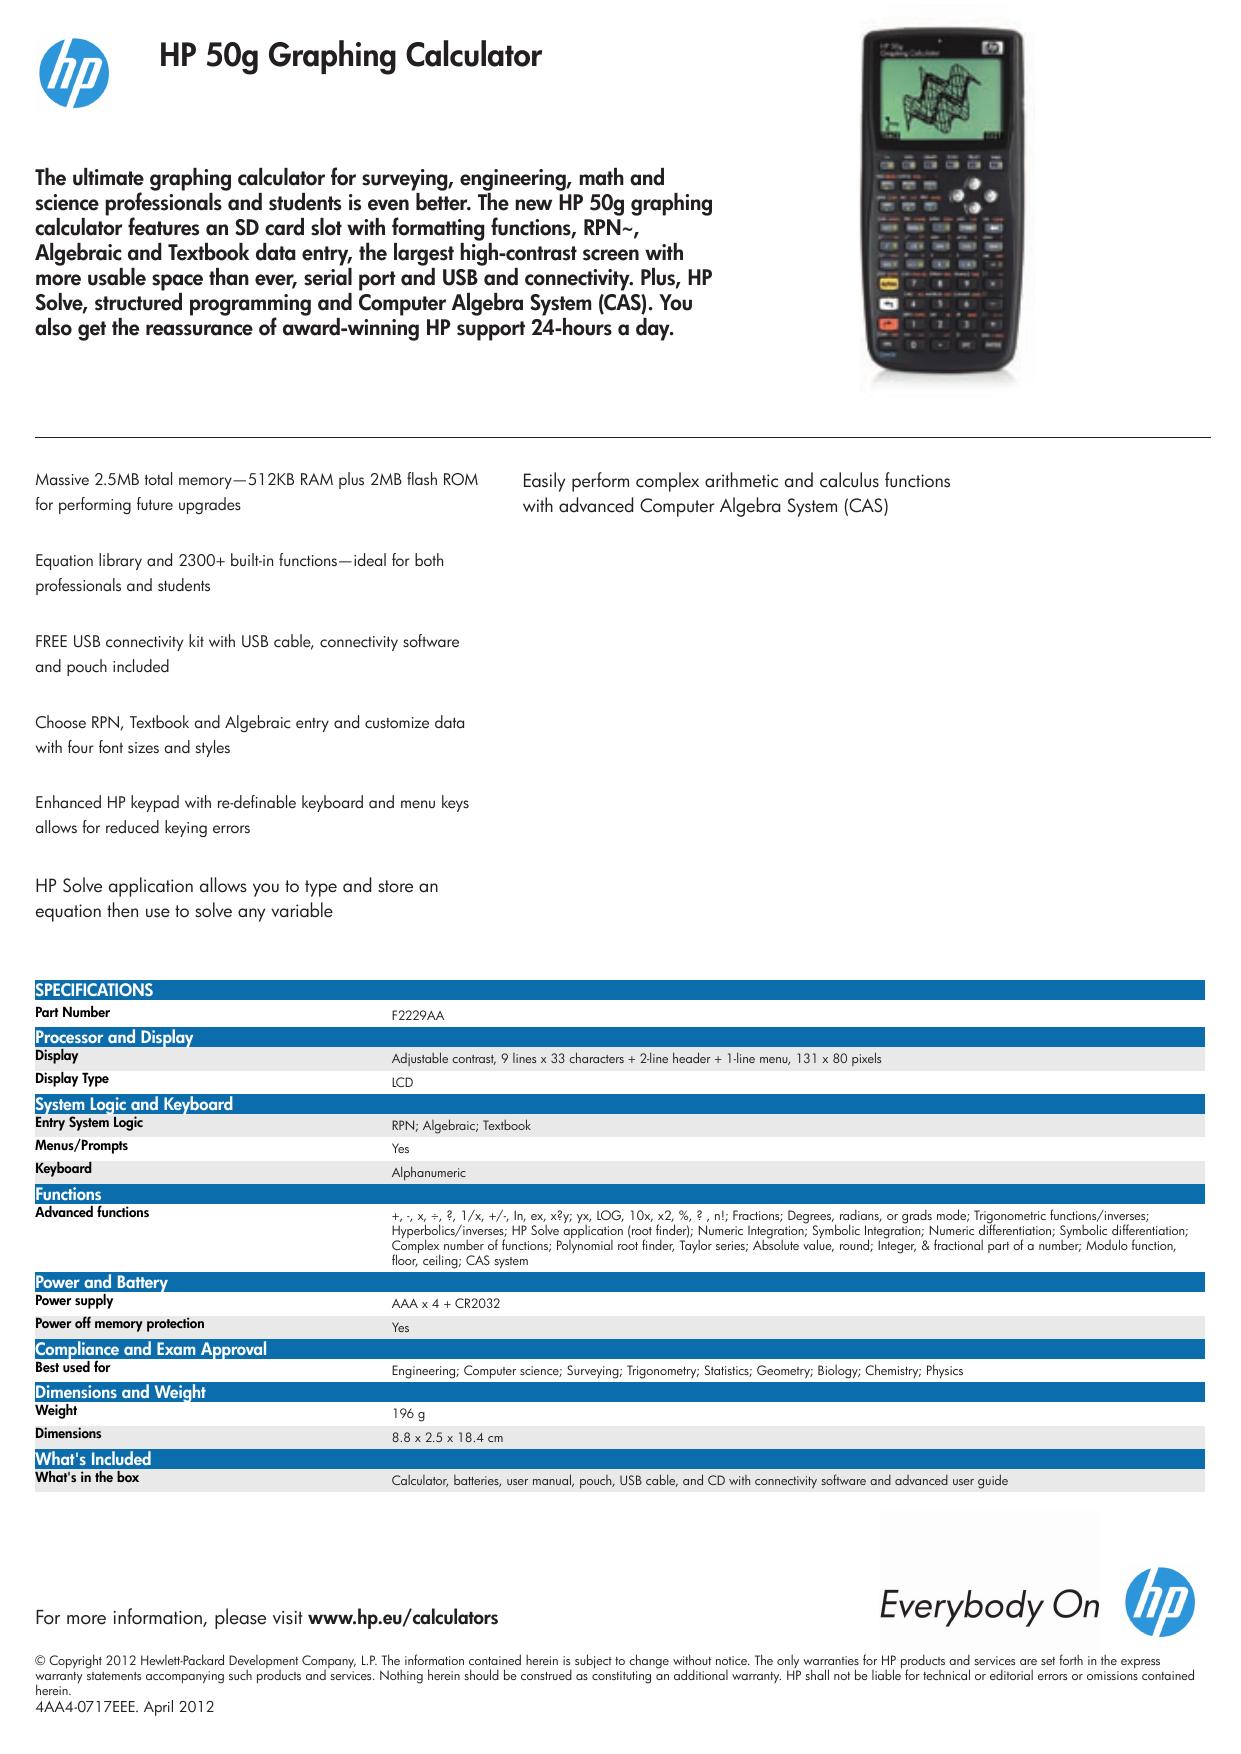 PSG Commercial Workstation Datasheet updated | manualzz com